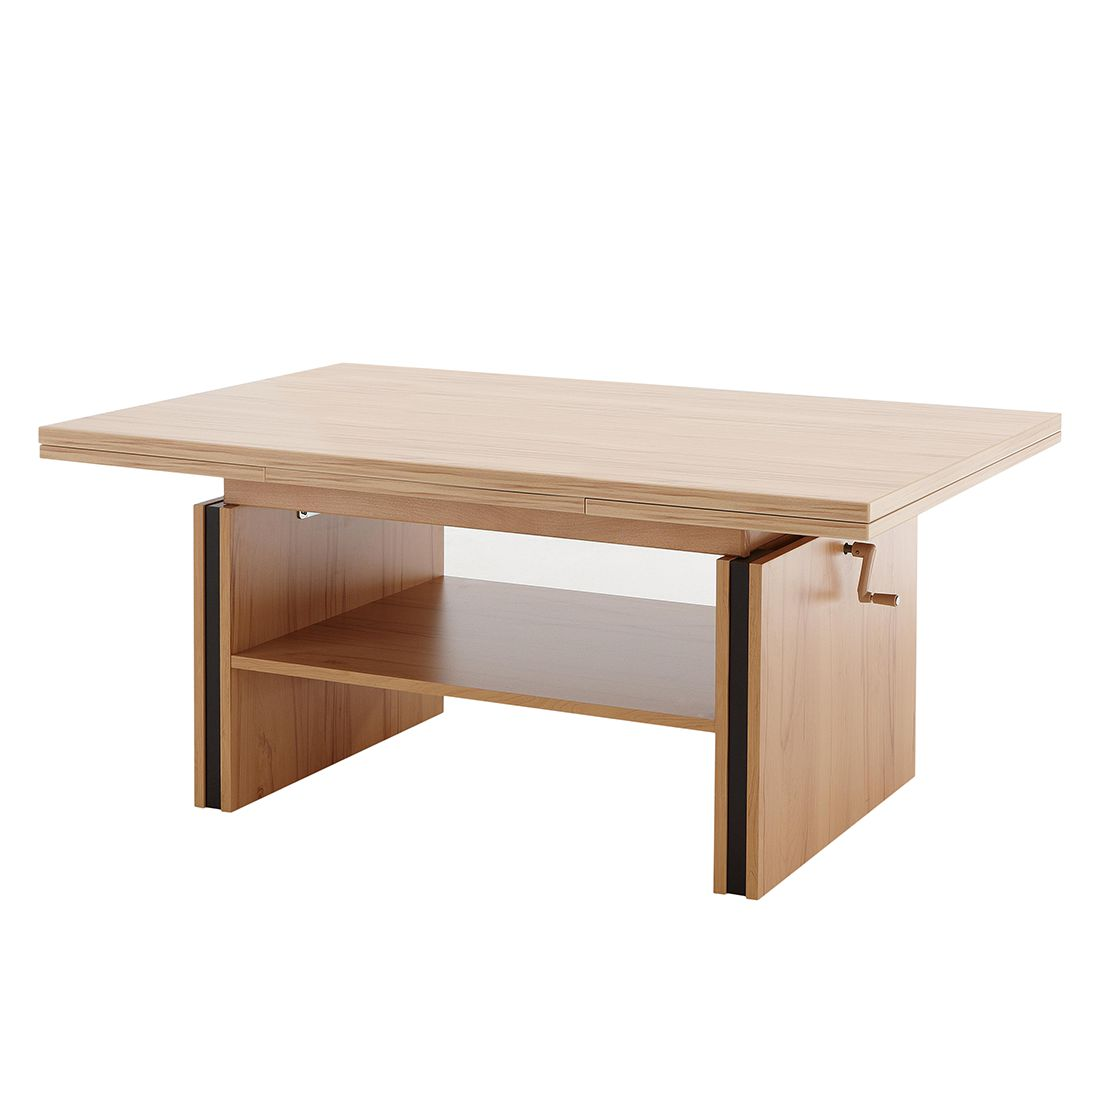 Table basse Panadura - Imitation duramen de hêtre, Modoform